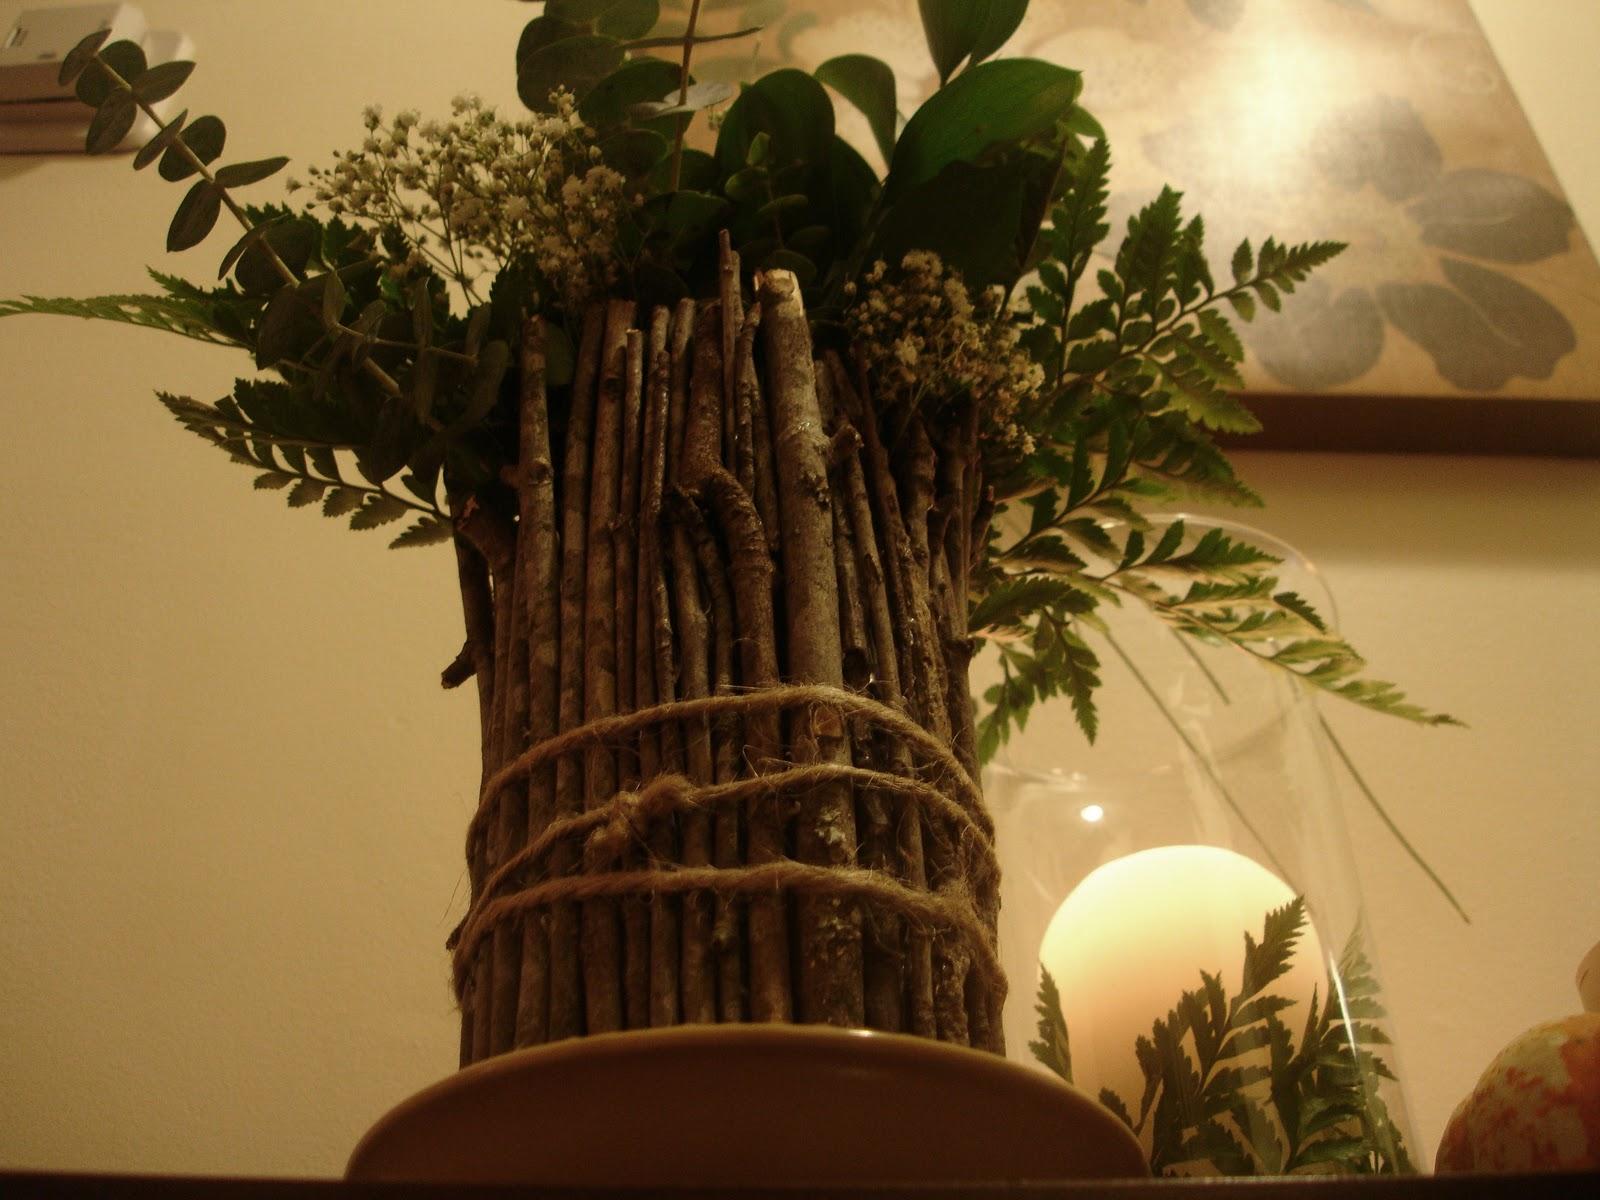 Don't Disturb This Groove: A Stick Vase